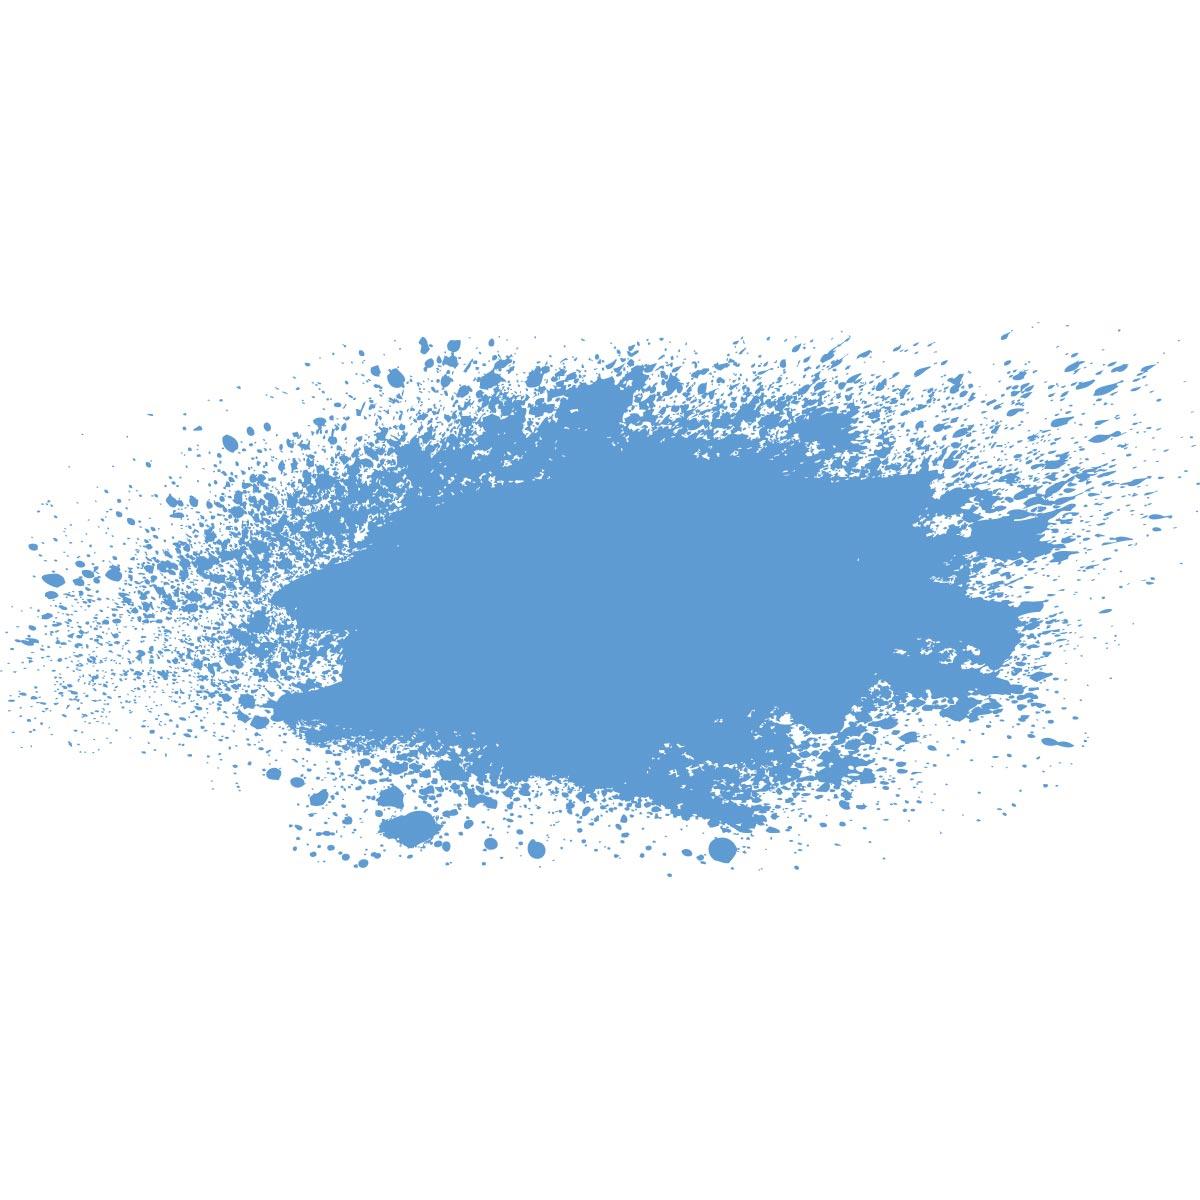 FolkArt ® Stencil Spray™ Acrylic Paint - Bright Blue, 2 oz.